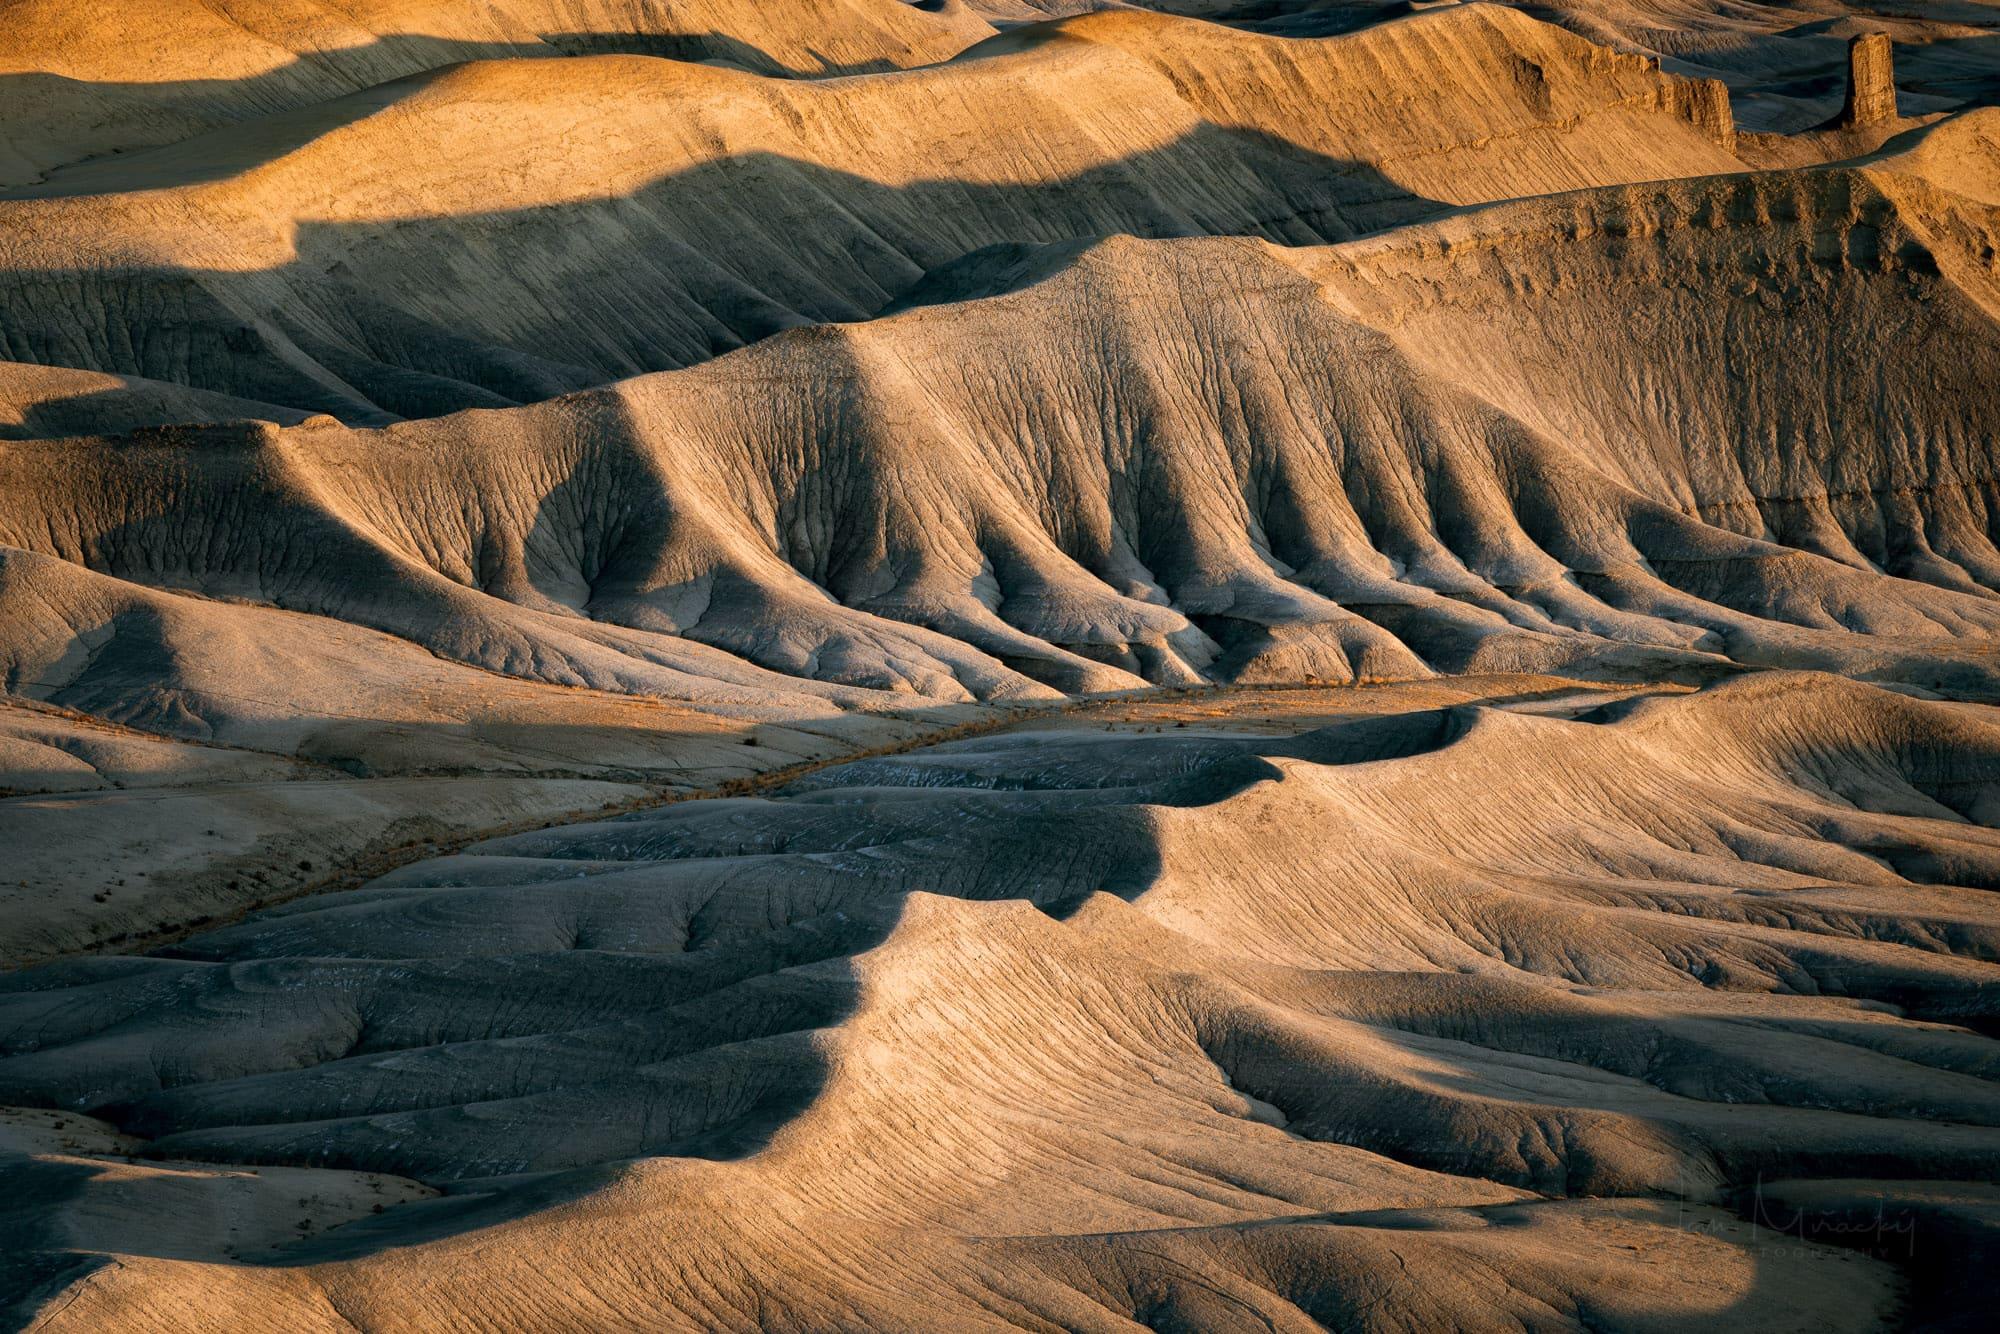 Detail of badlands, Utah